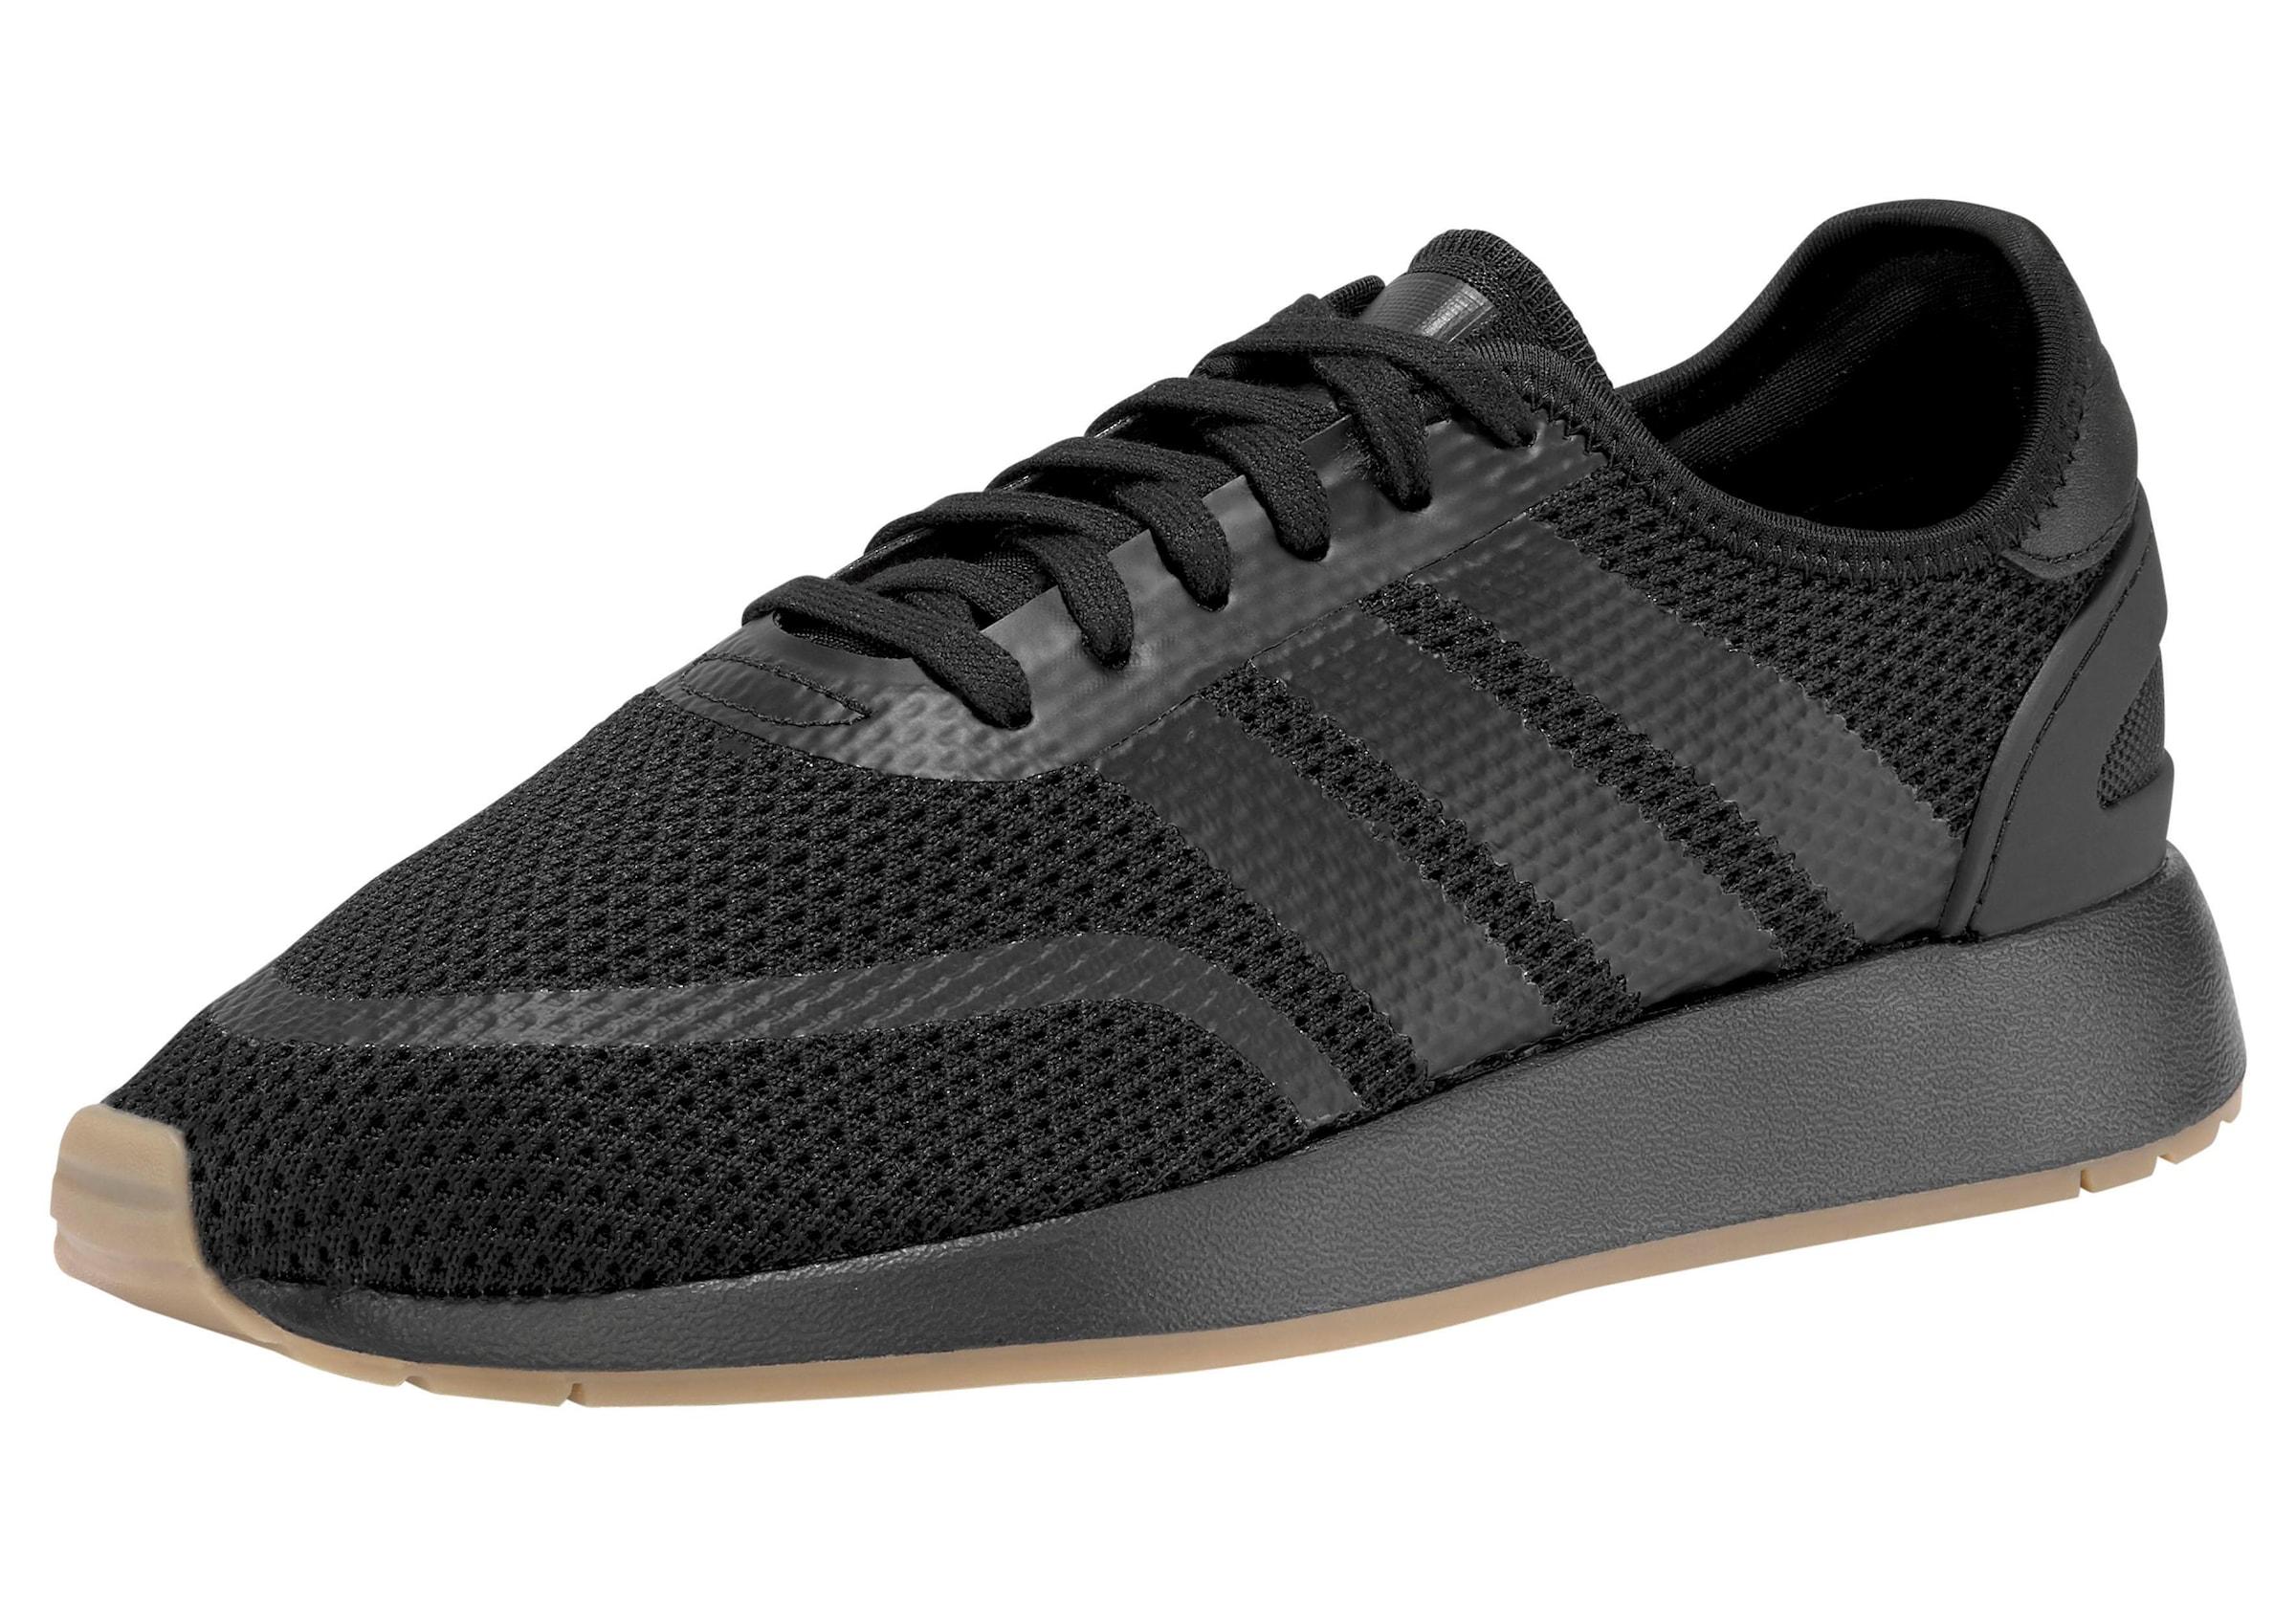 adidas sneaker n 5923 braun größe 37